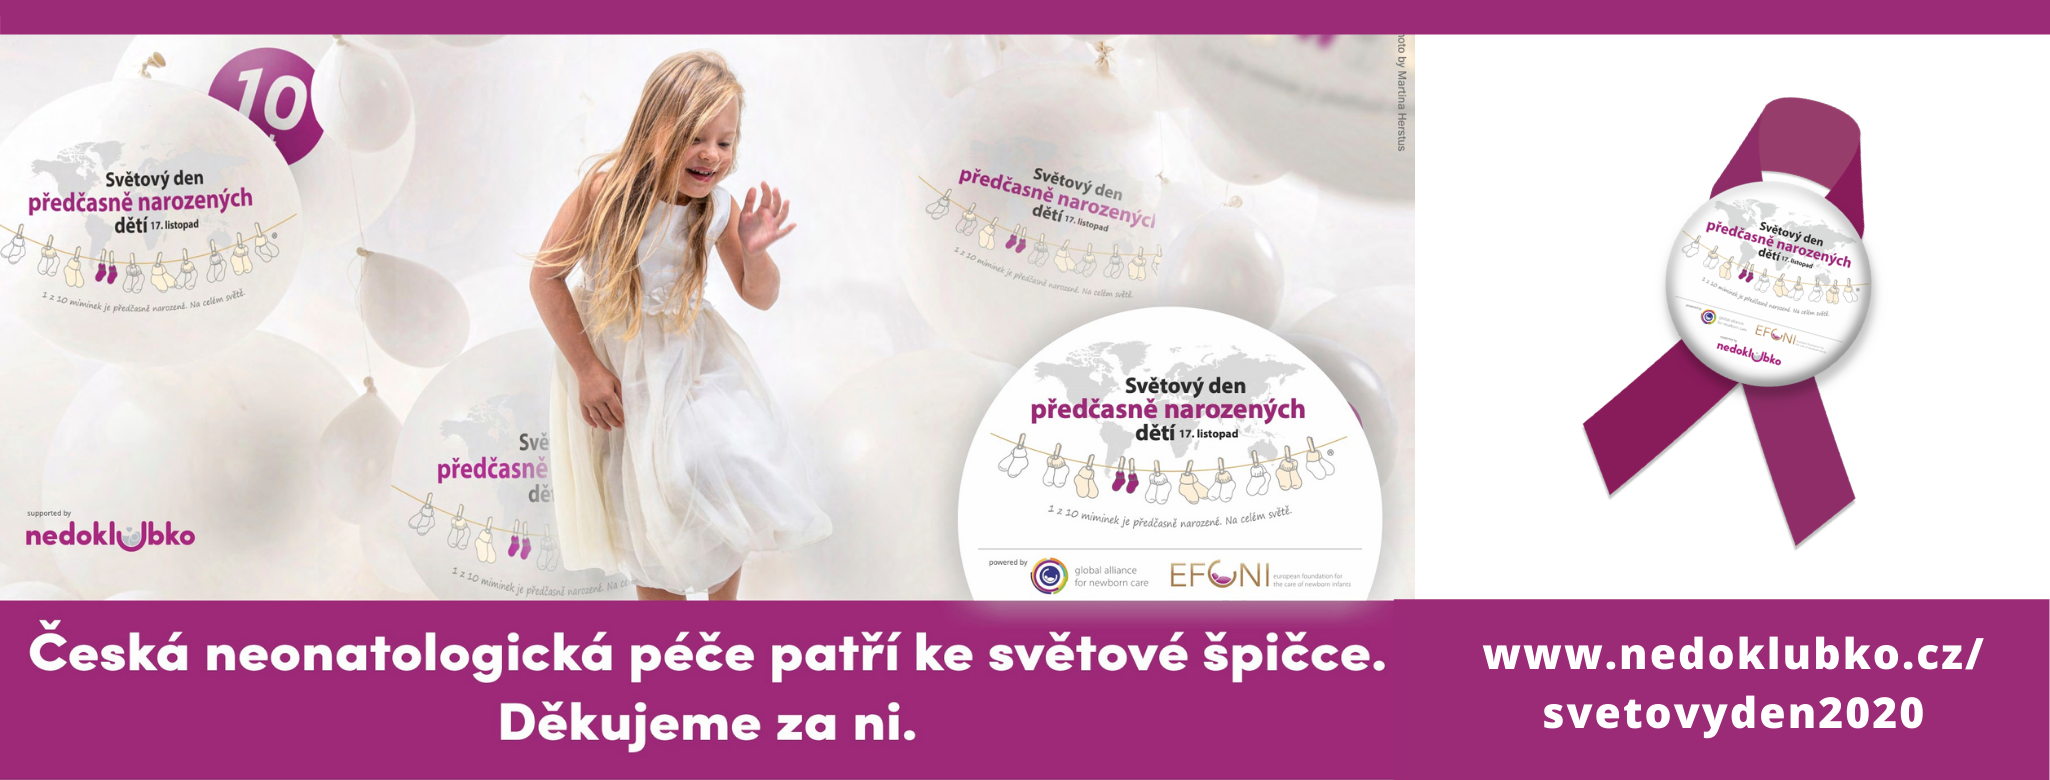 www.nedoklubko.cz_svetovyden2020